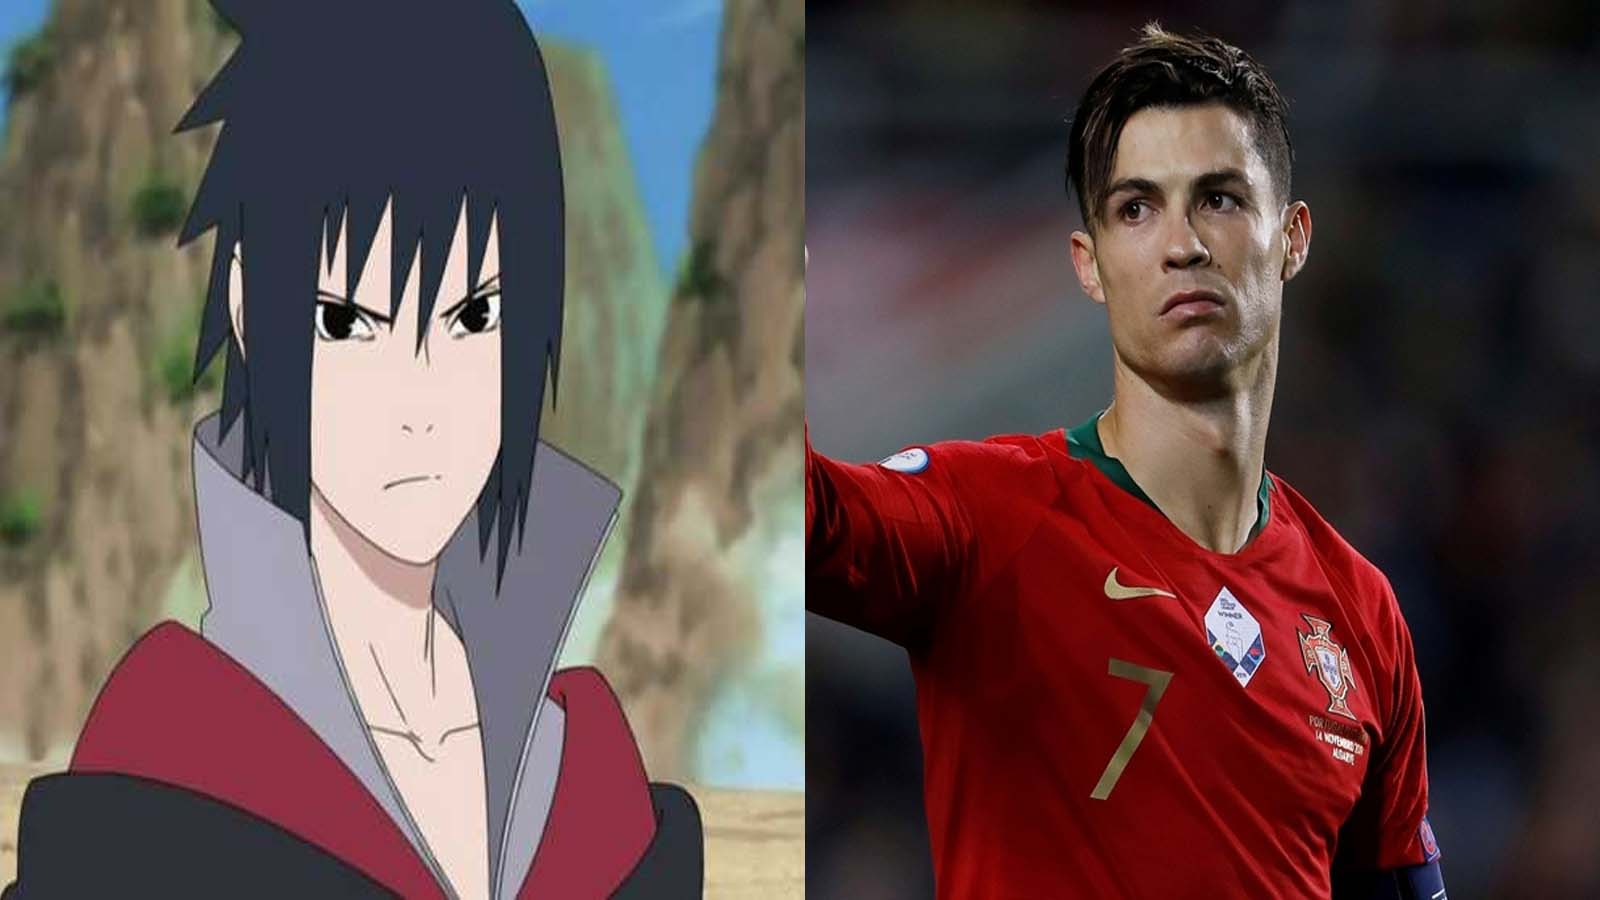 Personajes parecidos a Cristiano Ronaldo - Sasuke Uchiha